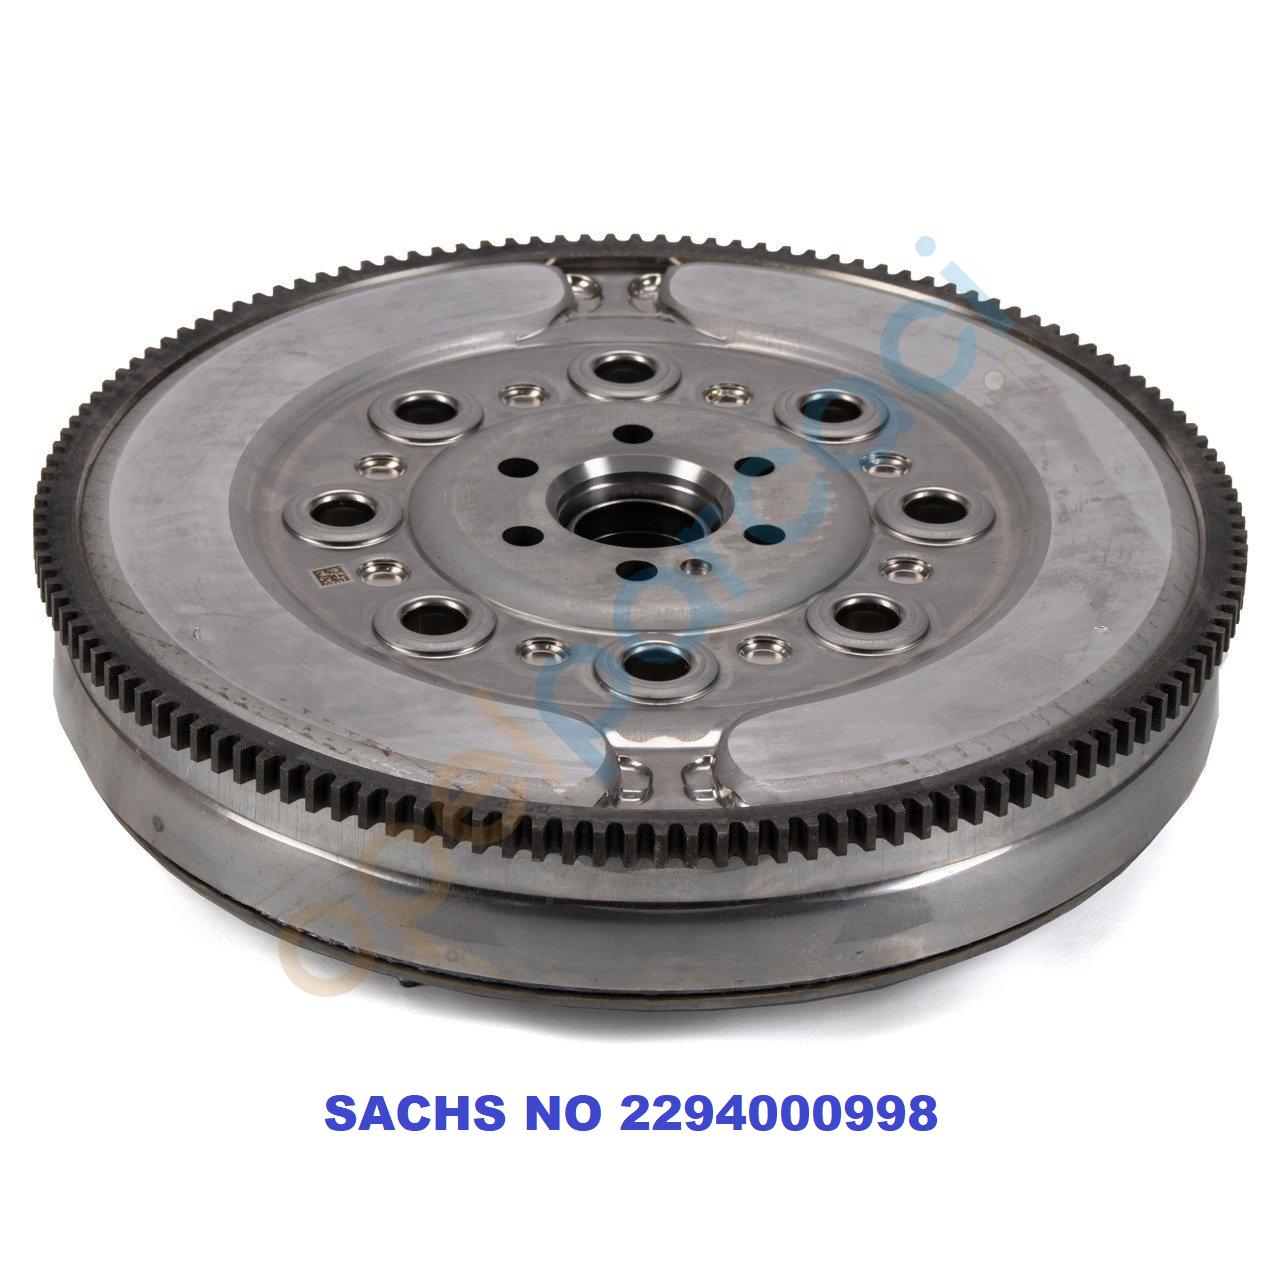 Opel Zafira B 1.6 Turbo Benzinli Volan Takviyeli SACHS 2294000998